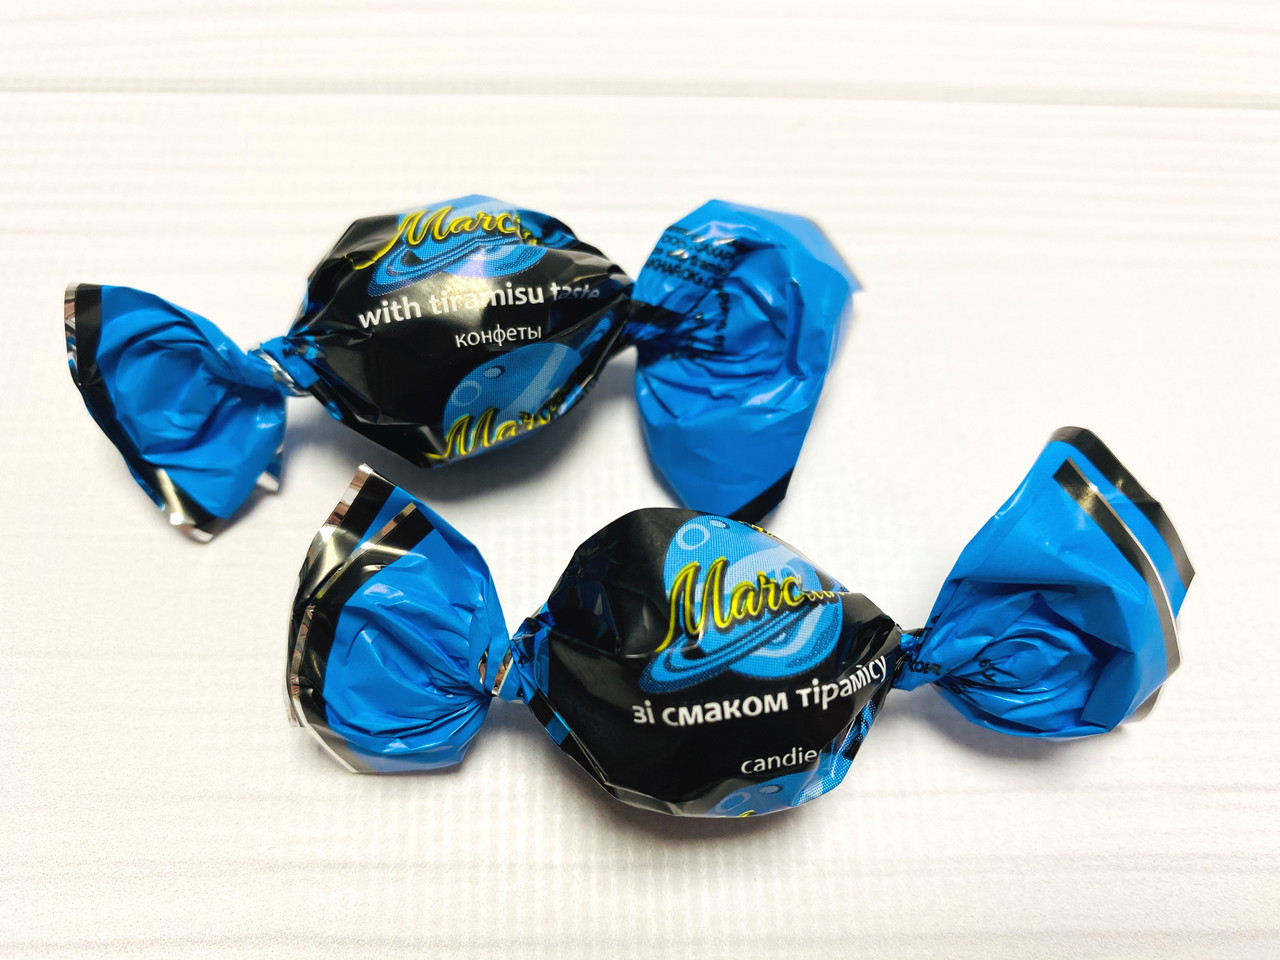 Цукерки Марсиано тірамісу 1.5 кг. ТМ Балу